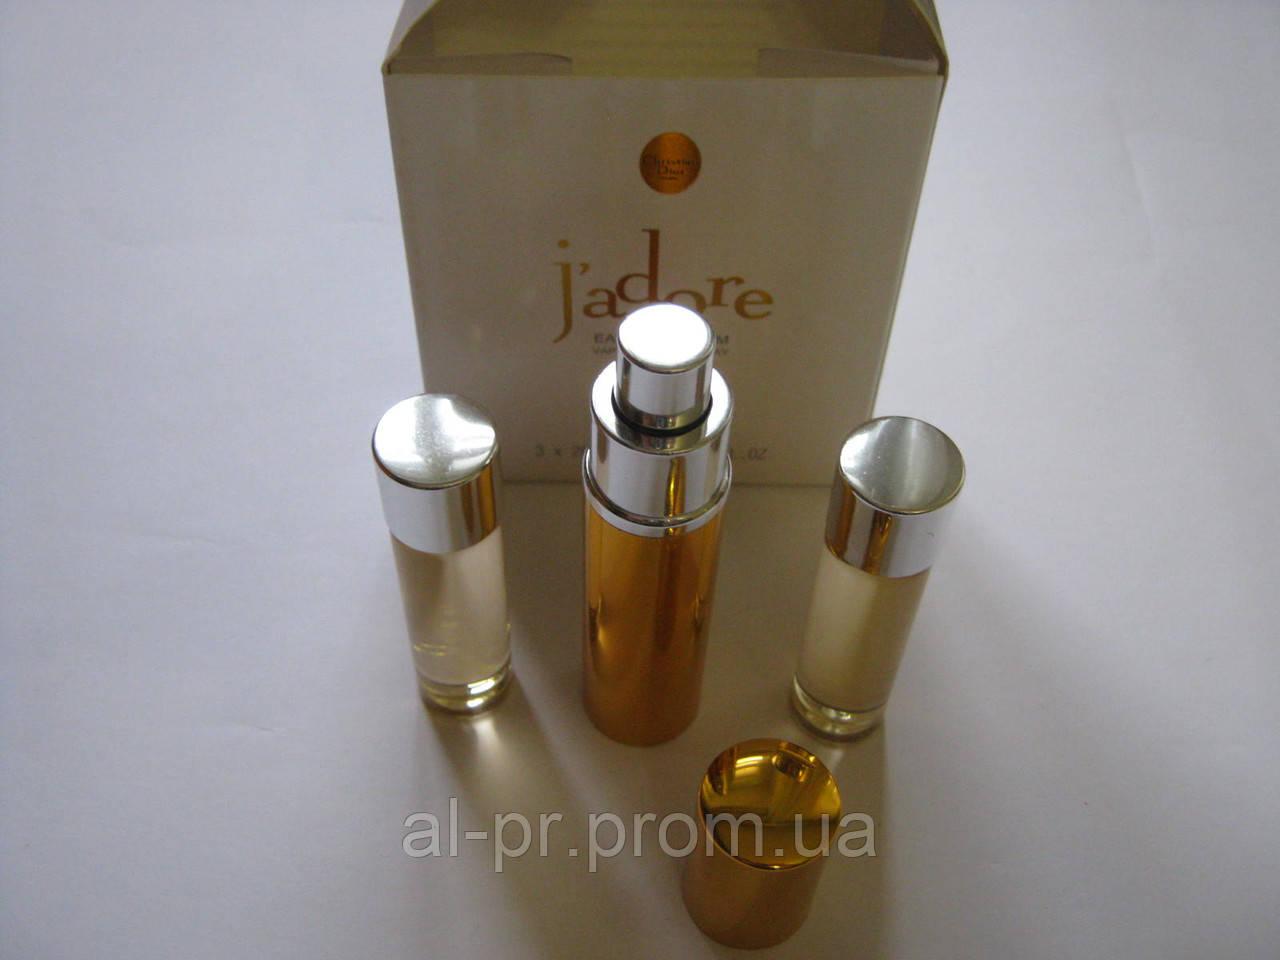 Набор парфюмерии Christian Dior Jadore (копия)